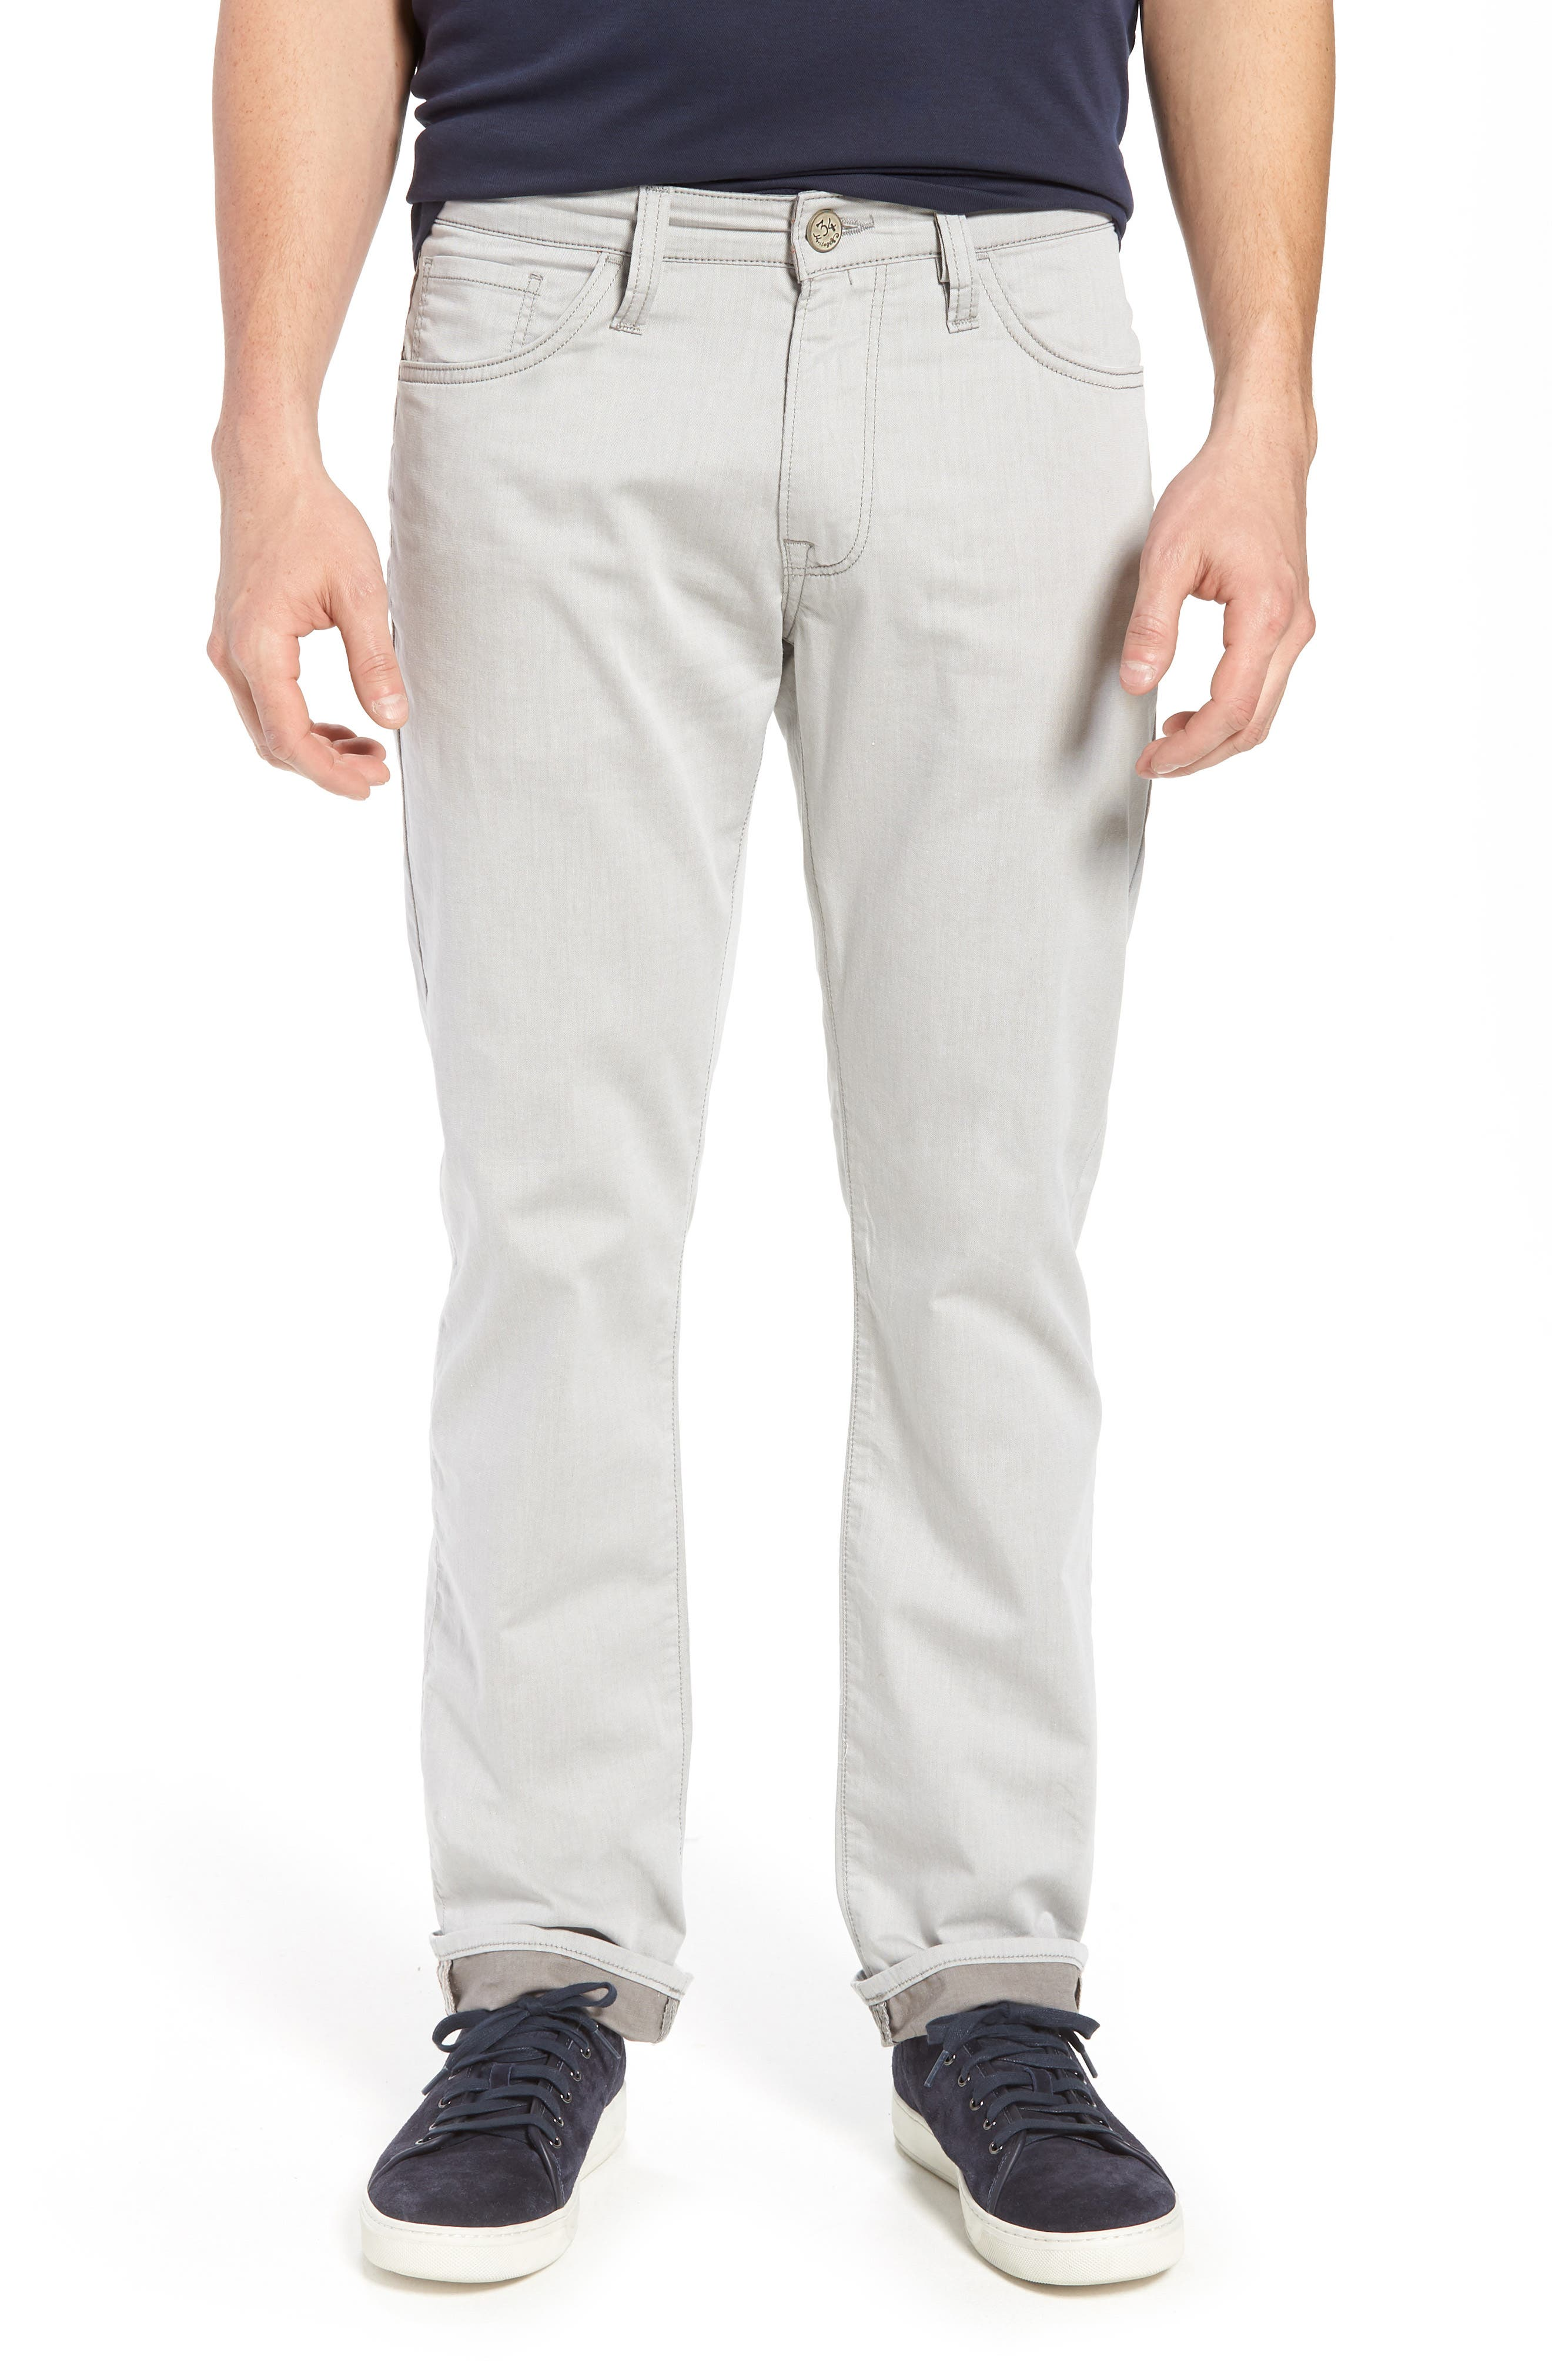 34 Heritage Courage Straight Leg Jeans (Latte Herringbone Reversed)